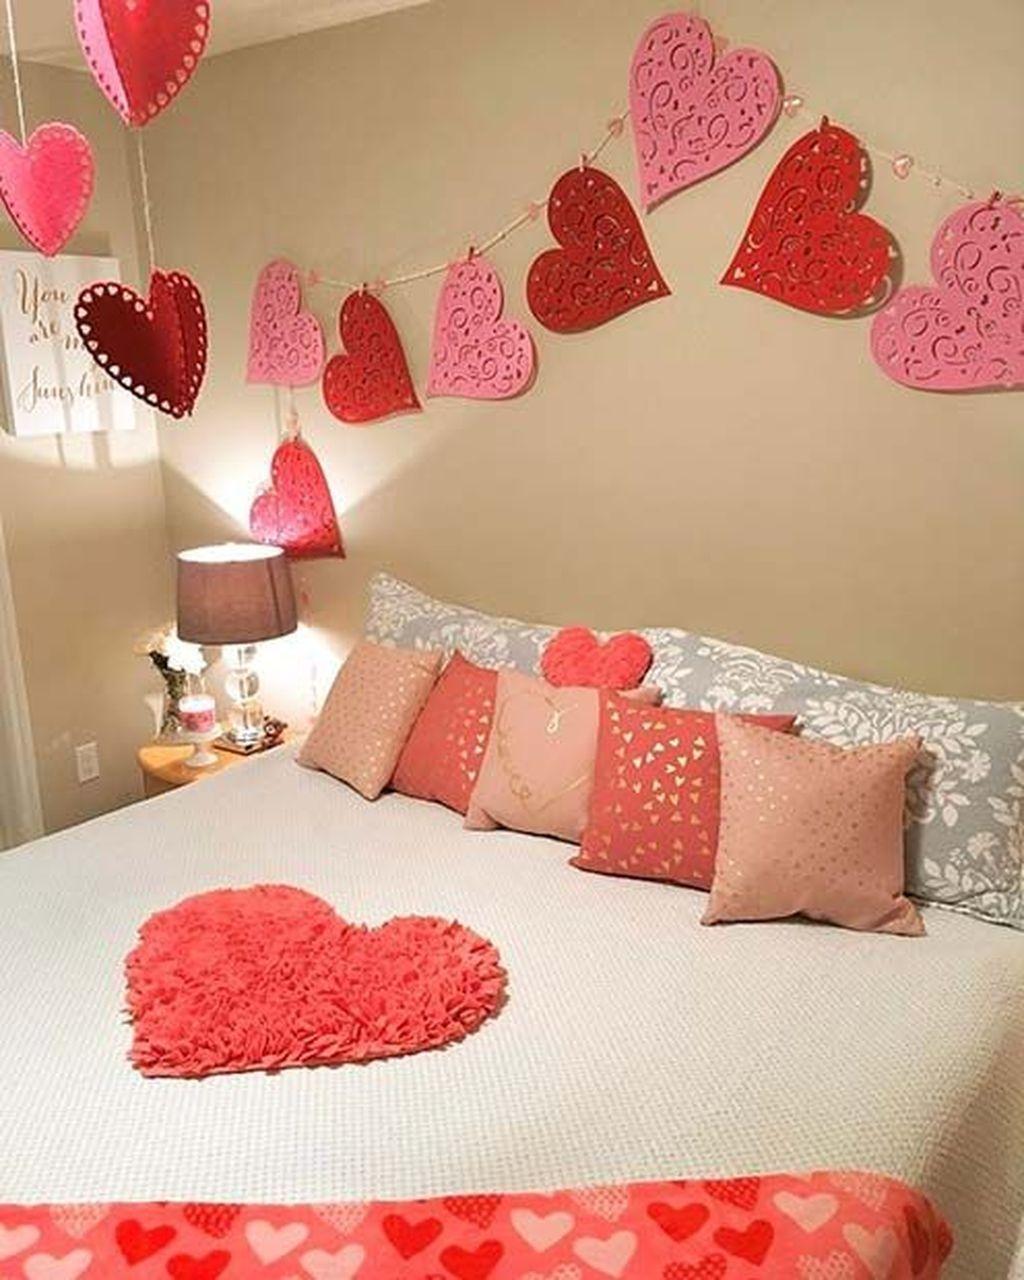 20 Romantic Bedroom Ideas: 20+ Beautiful And Romantic Valentine's Day Bedroom Design